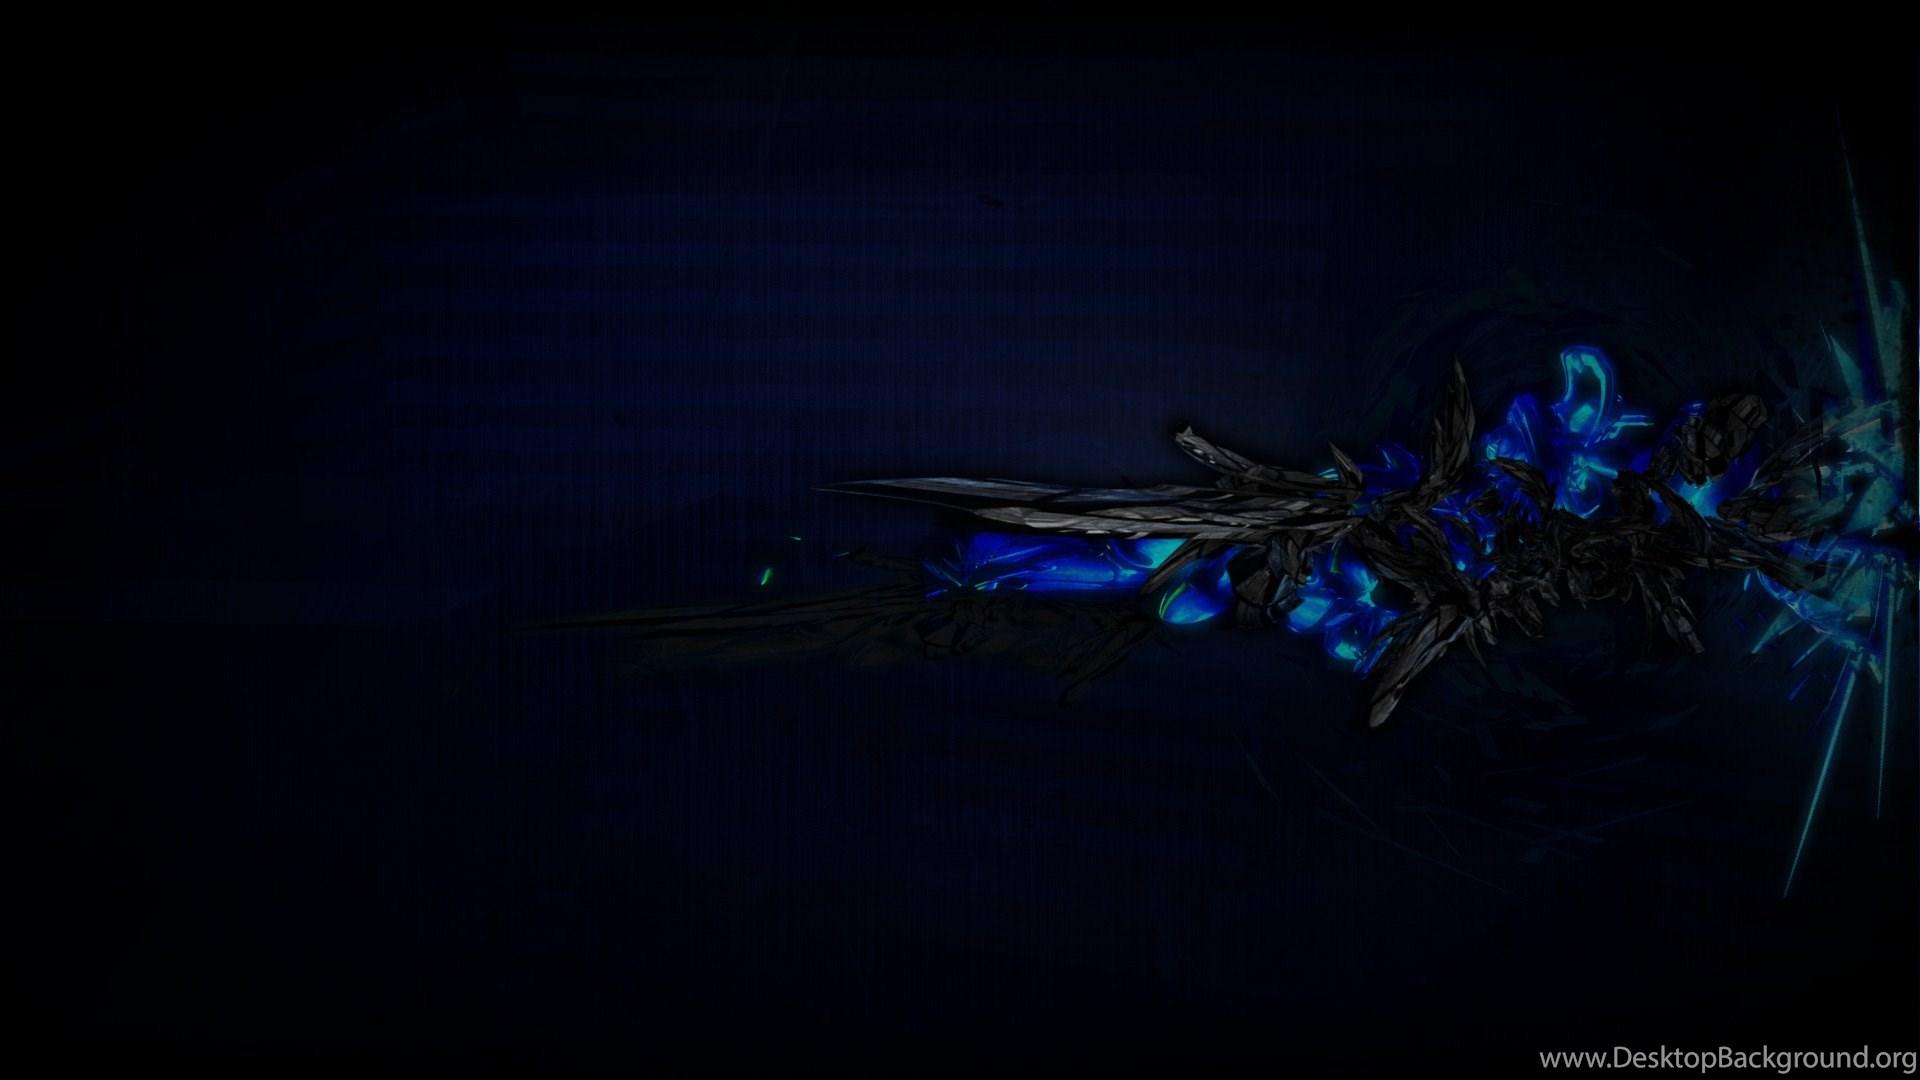 Dark Blue Wallpapers Hd Desktop Background